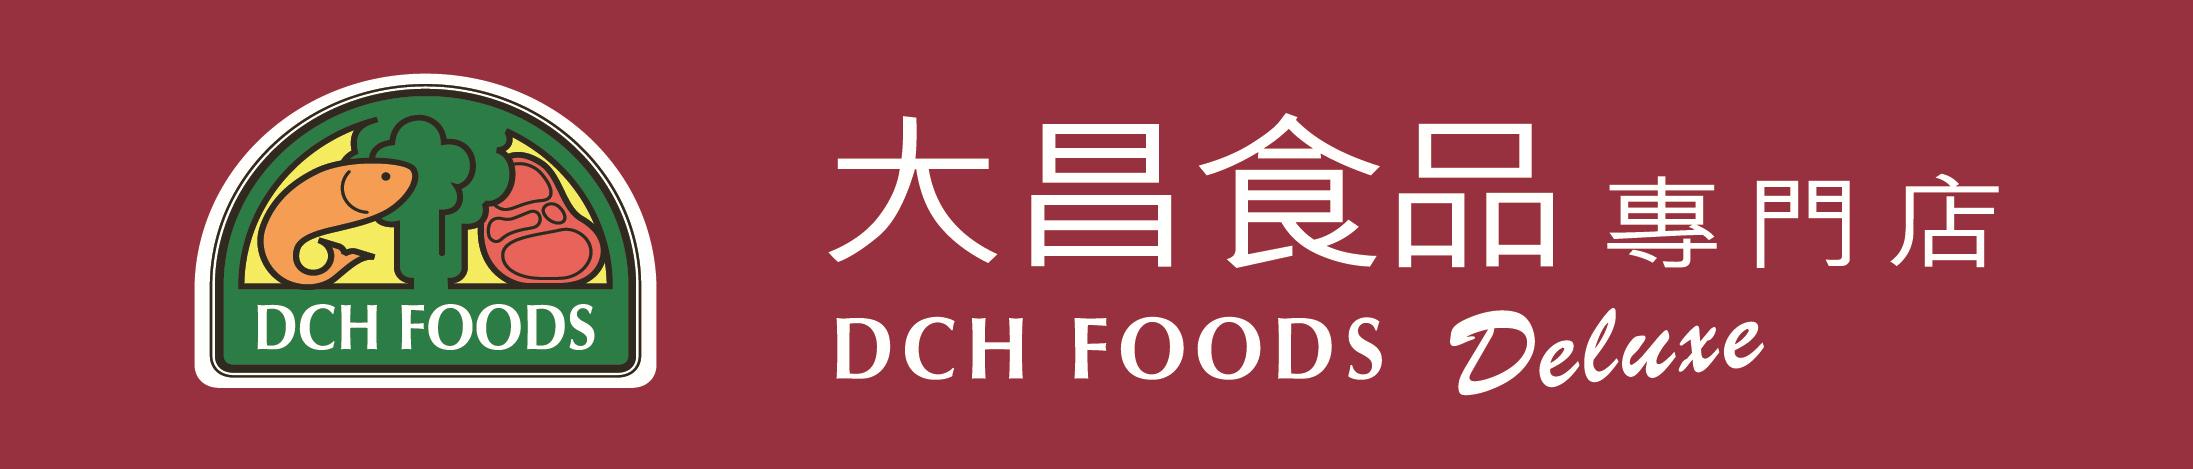 food scheme 2015 gold DCH FoodMart